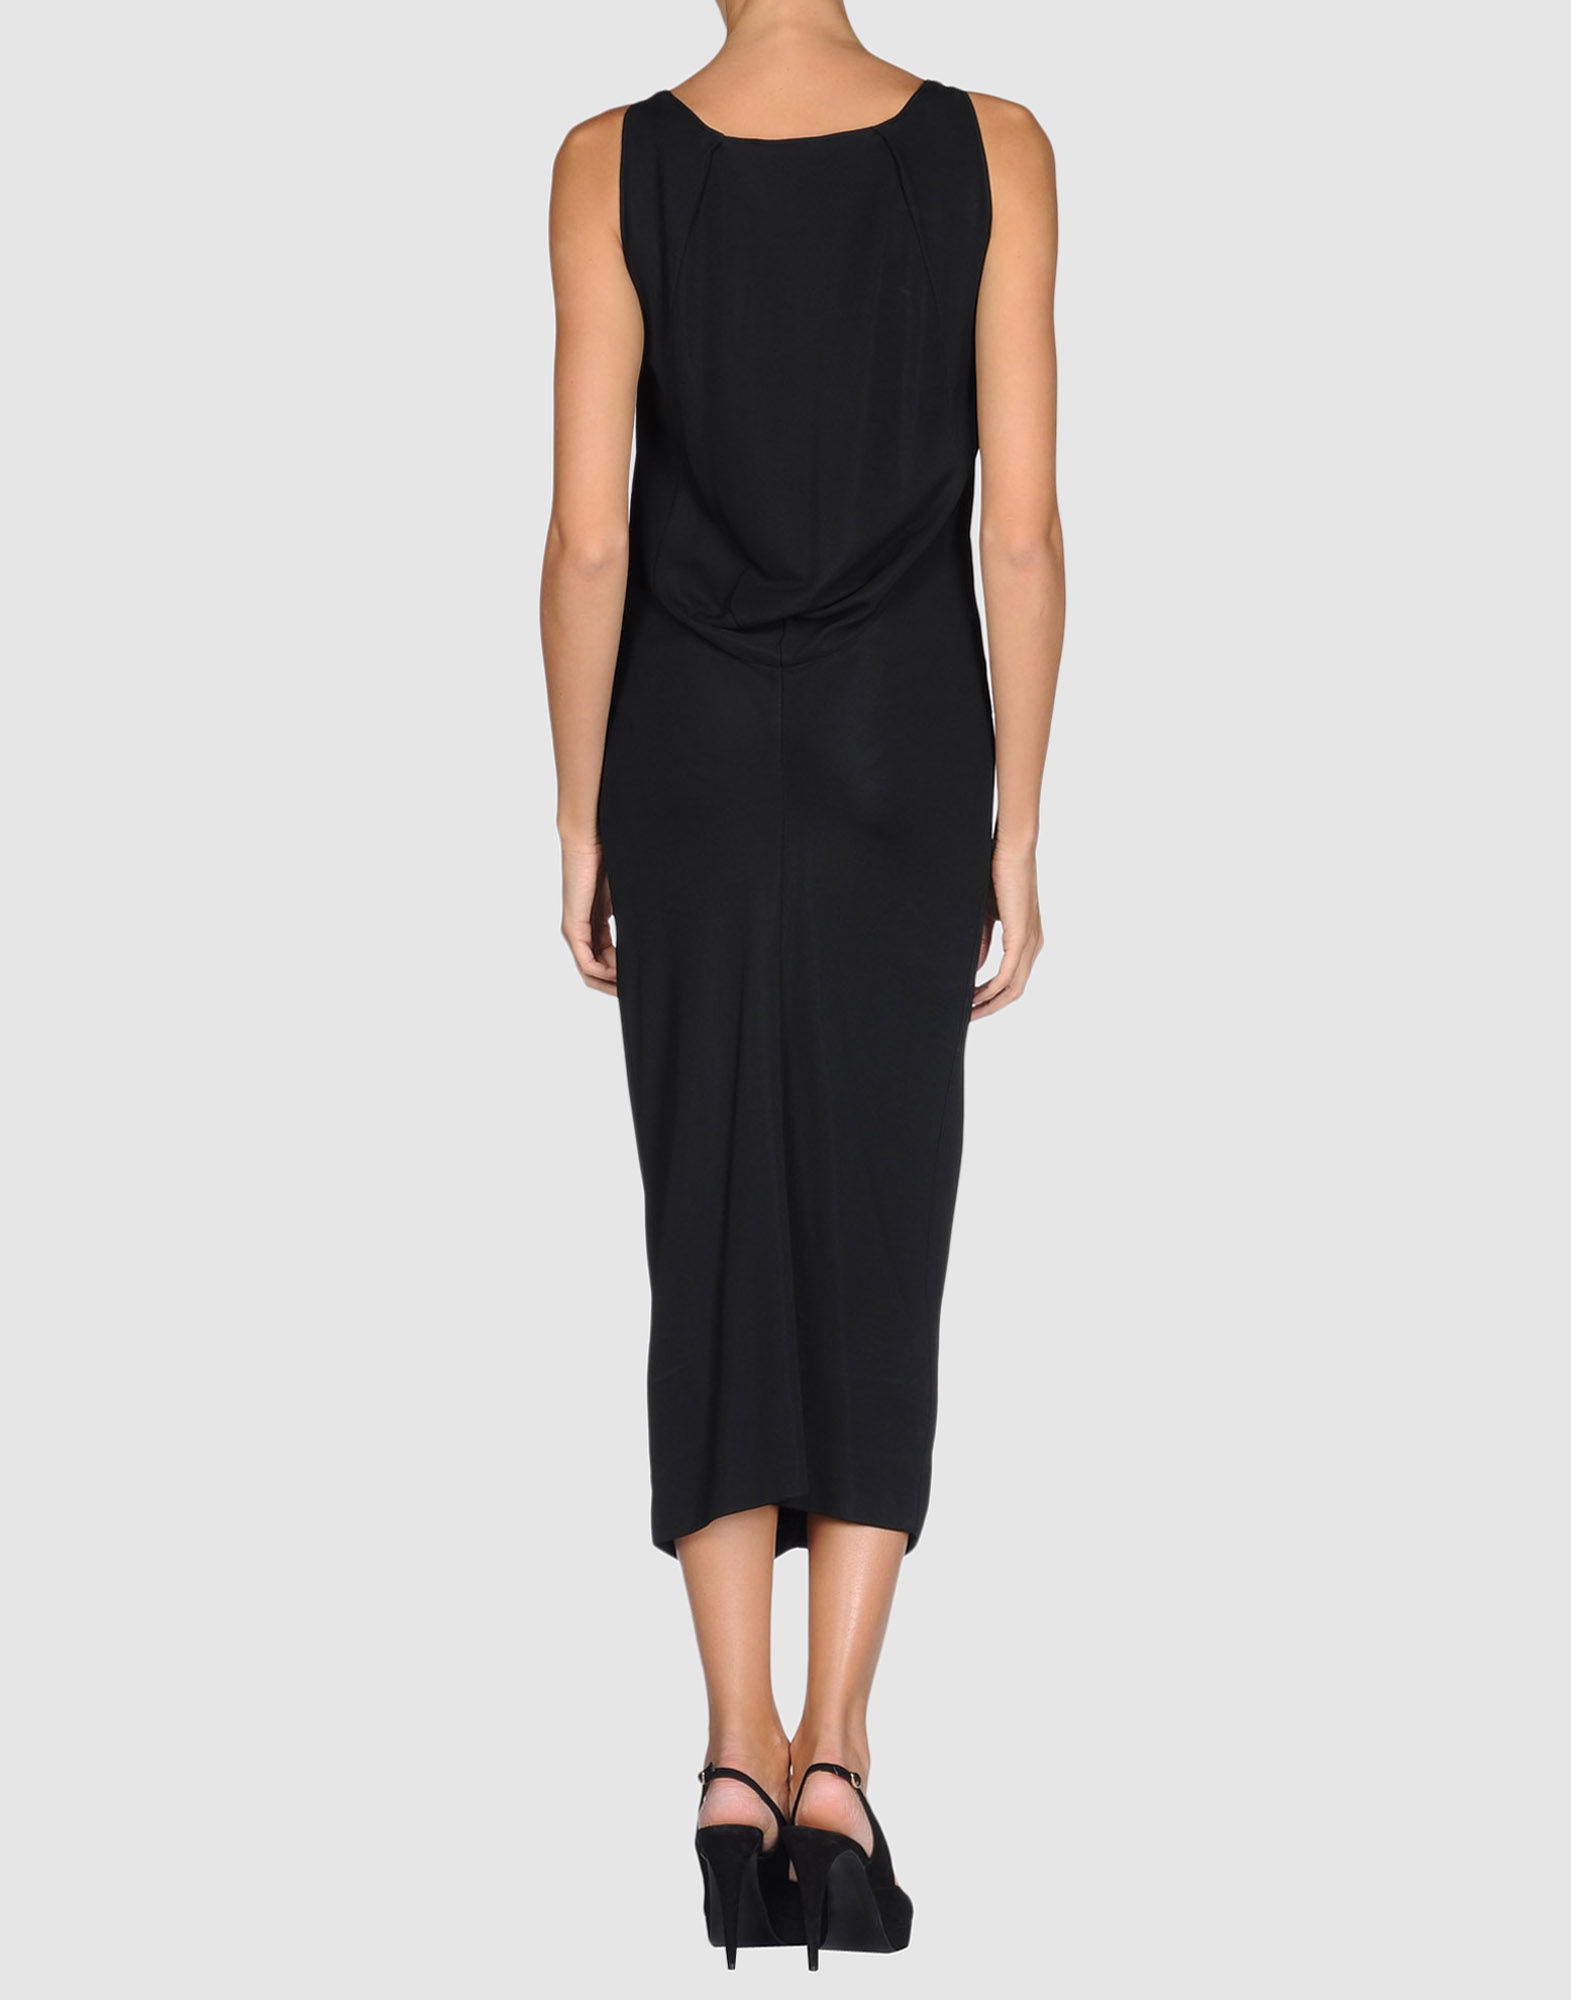 34220388TU 14 r - Βραδυνα Φορεματα Yves Saint Laurent Rive Gauche Κωδ.43